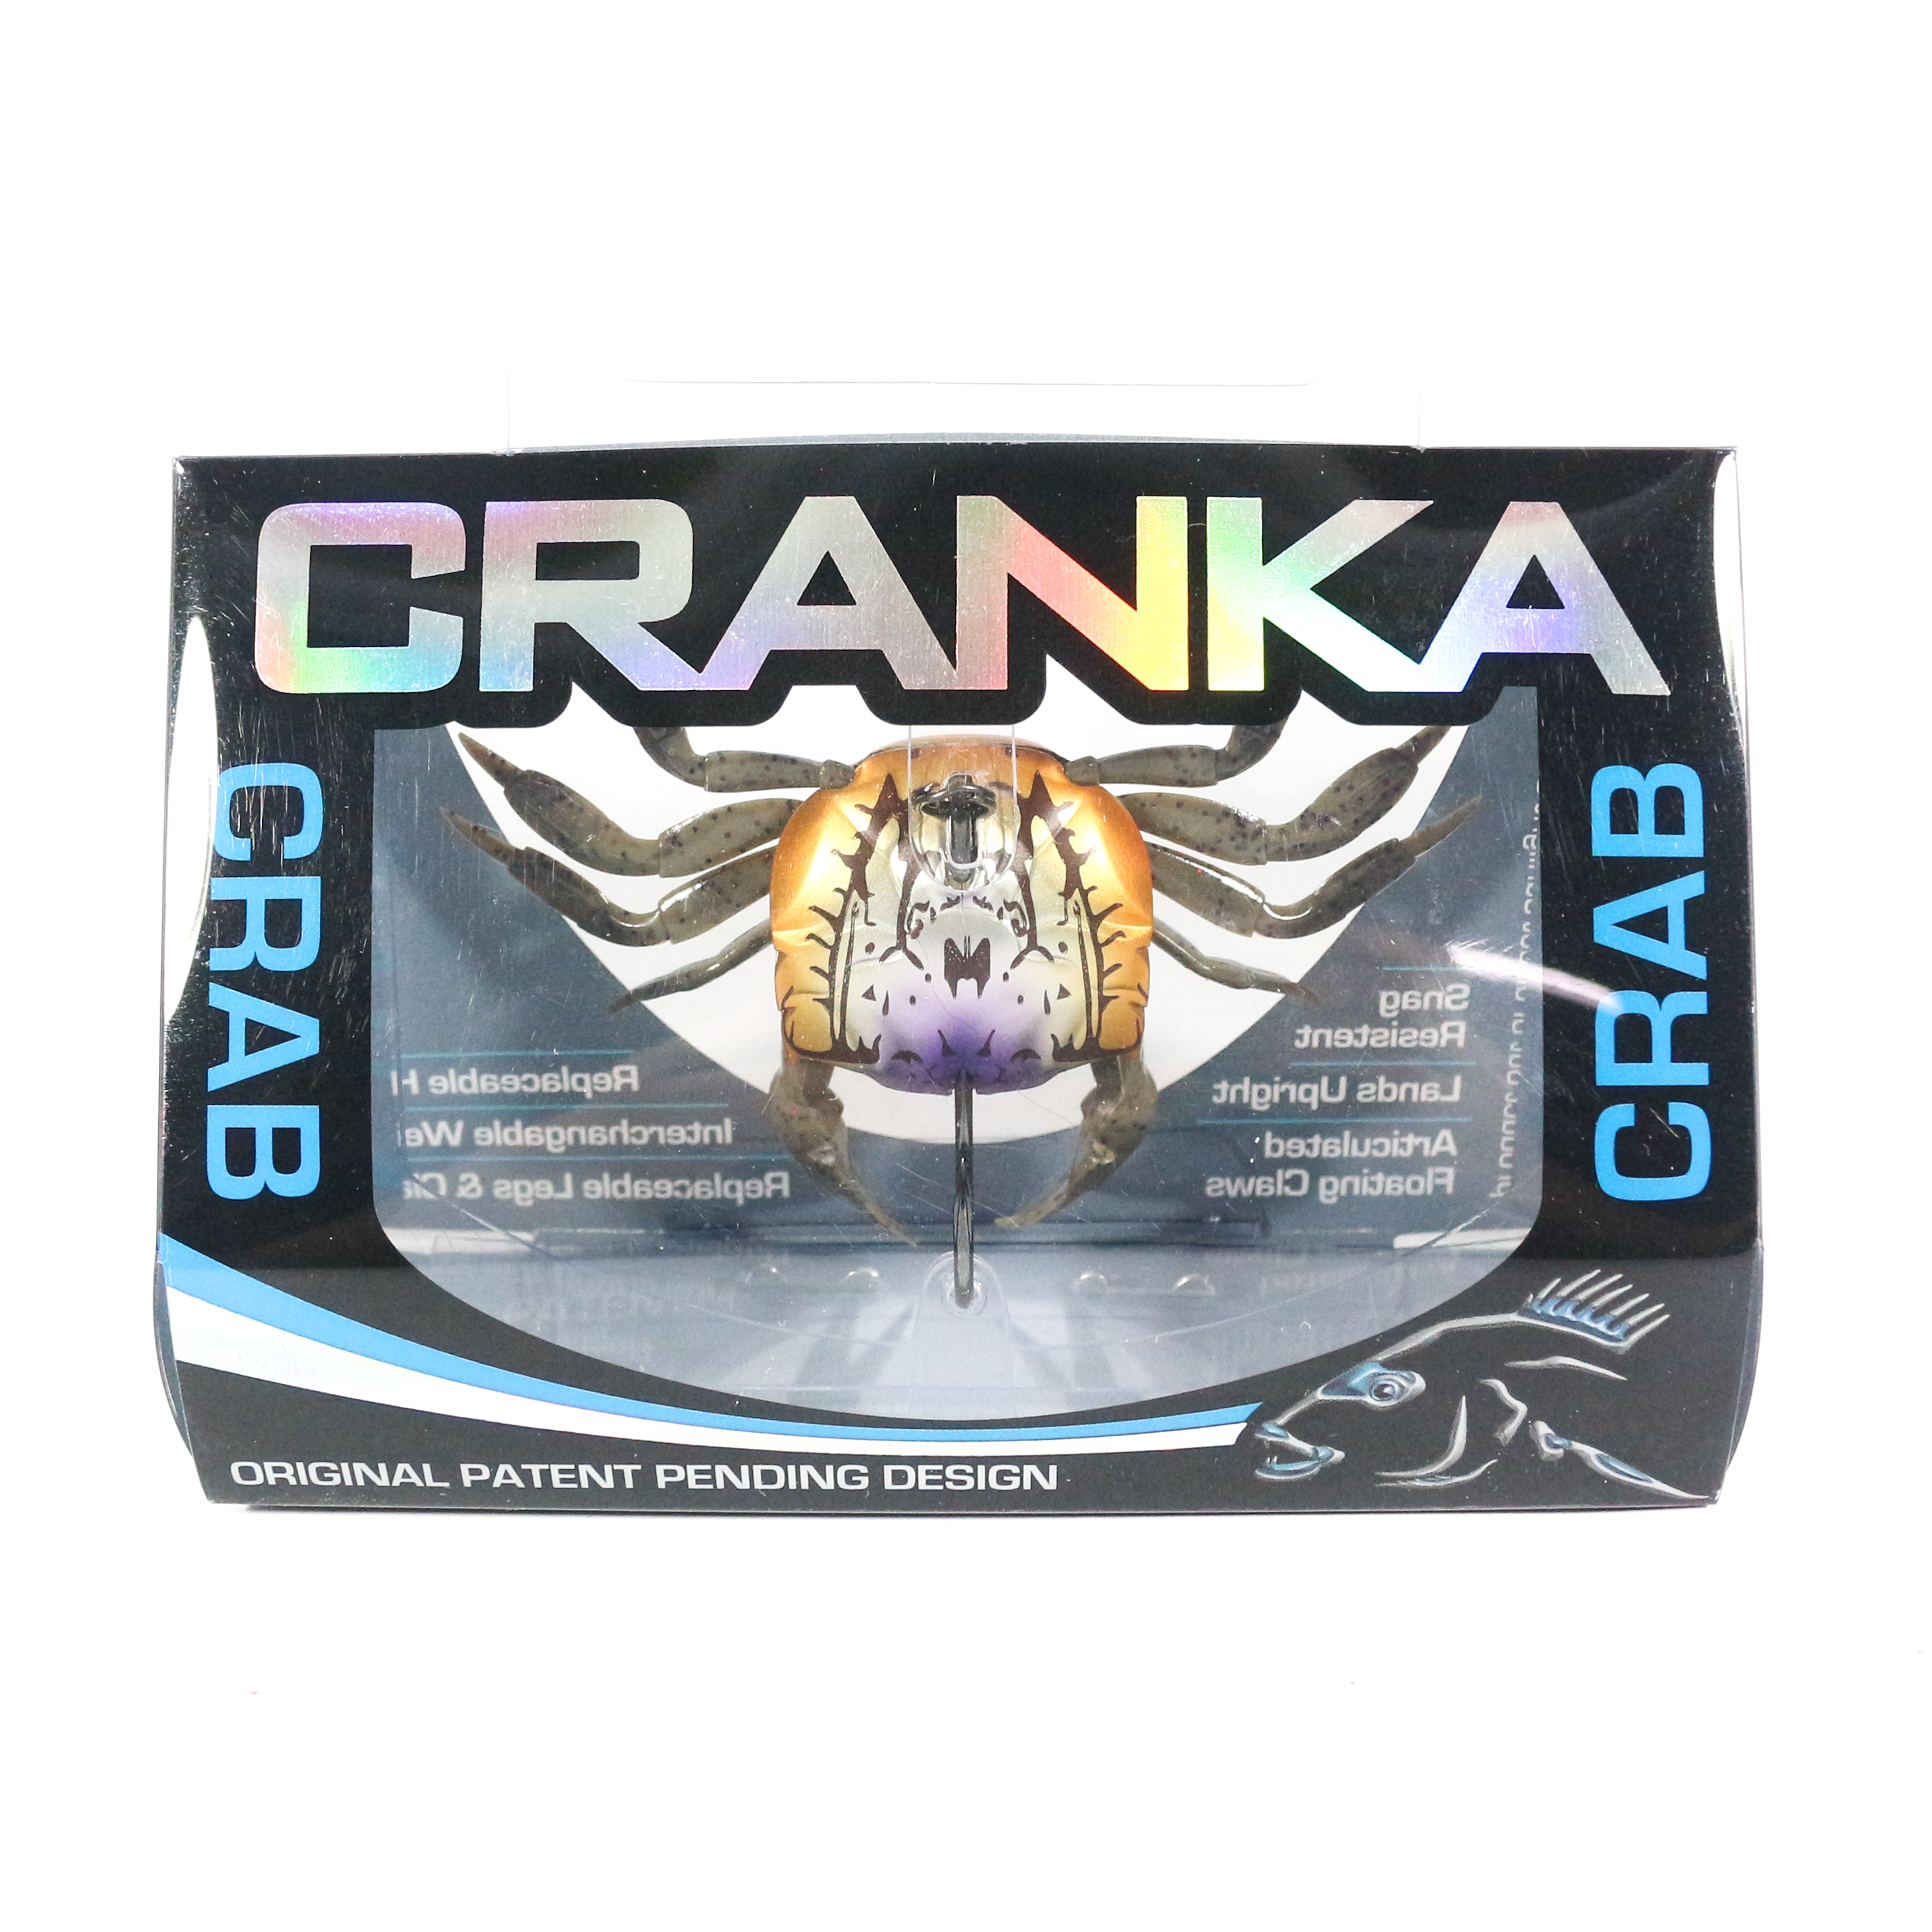 Cranka Crab Sinking Lure 21 grams CRS-85-MFD (5488)